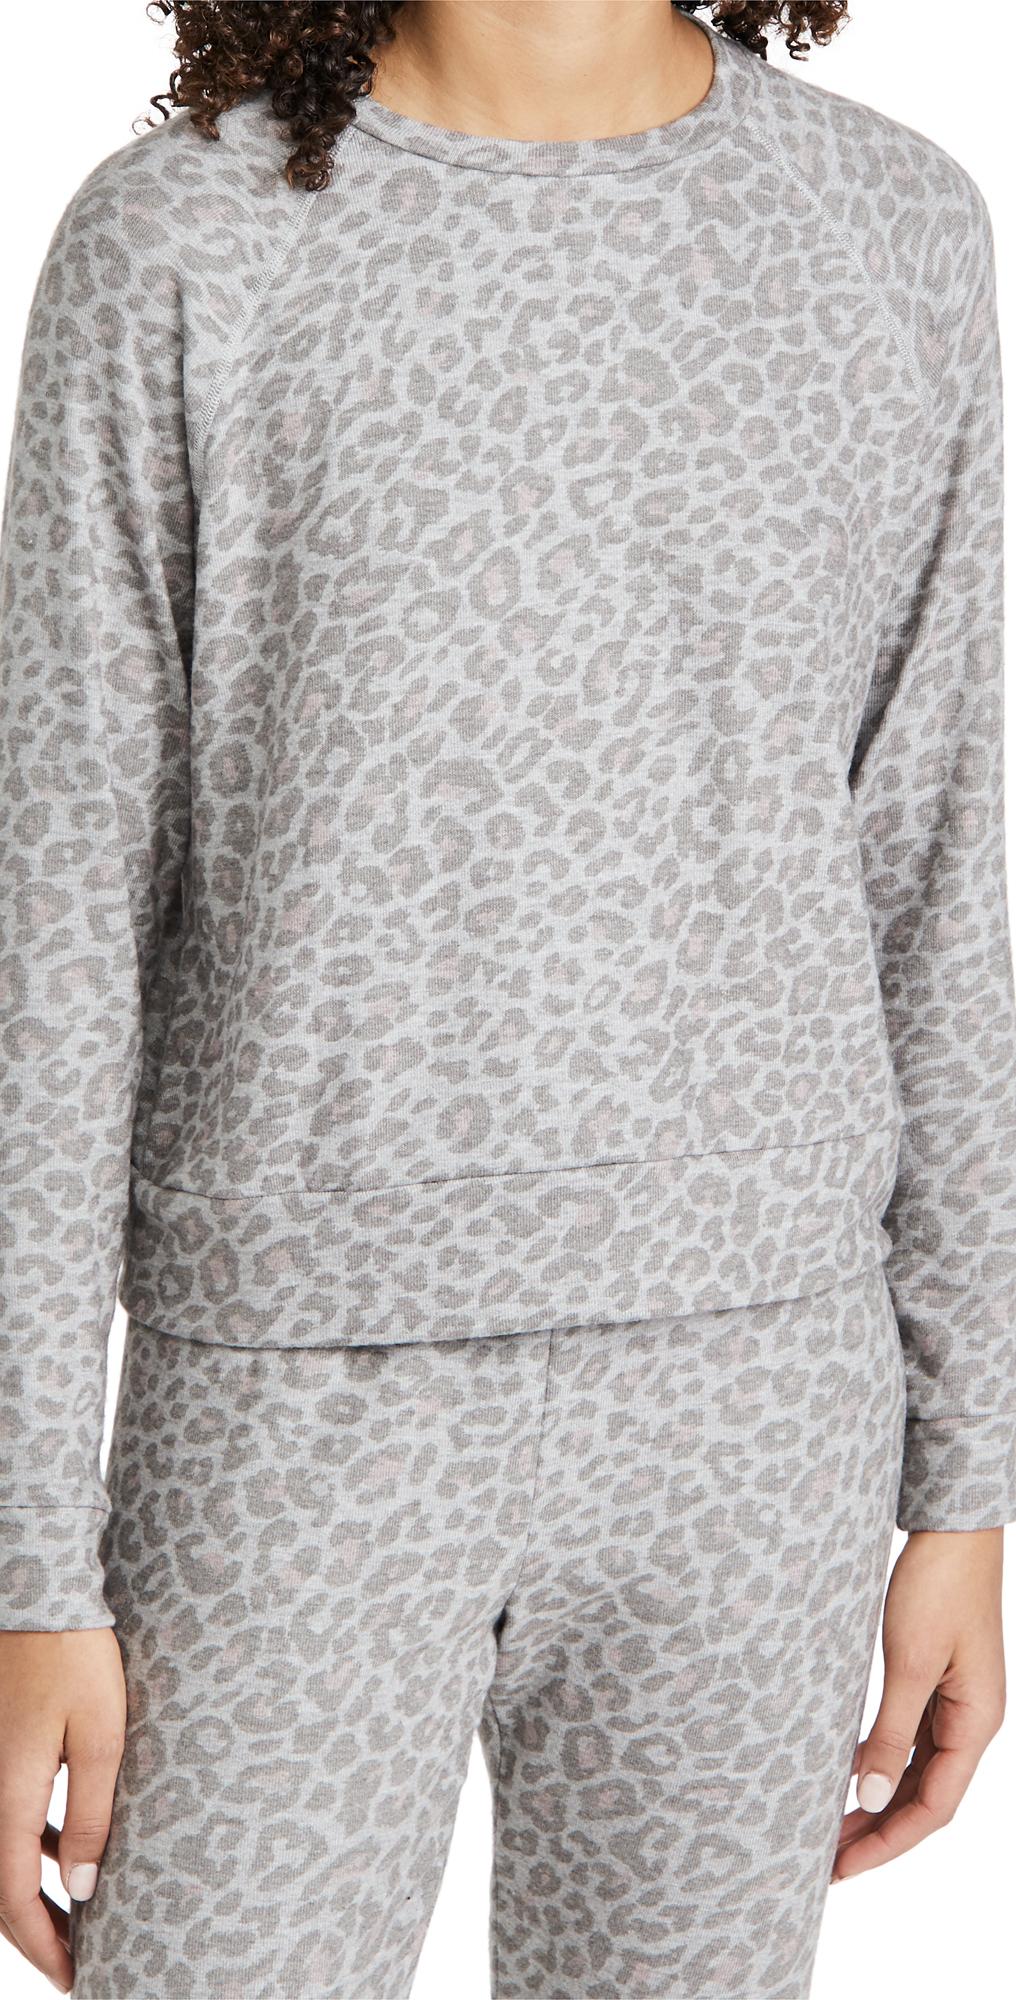 Beyond Yoga Printed Favorite Raglan Crew Pullover Sweatshirt